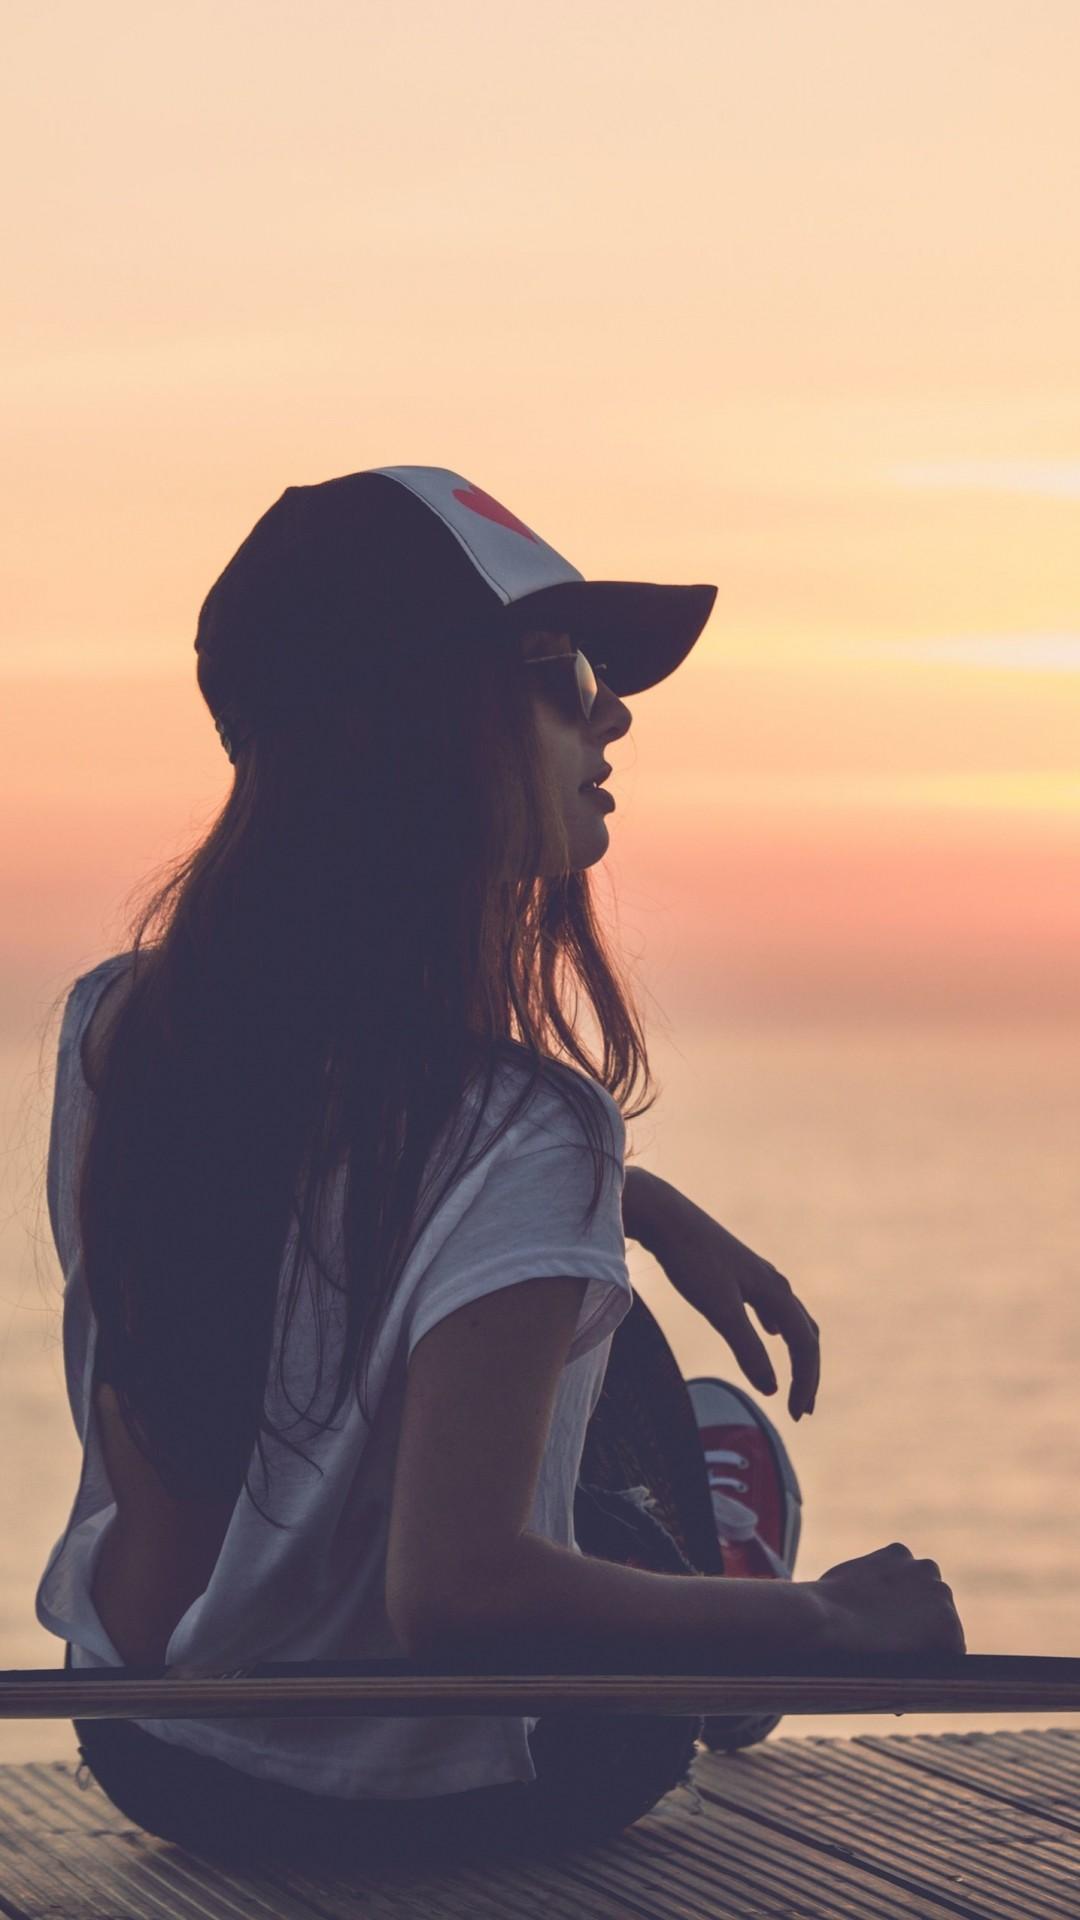 Preview wallpaper girl, skate, sea, sunset, cap 1080×1920